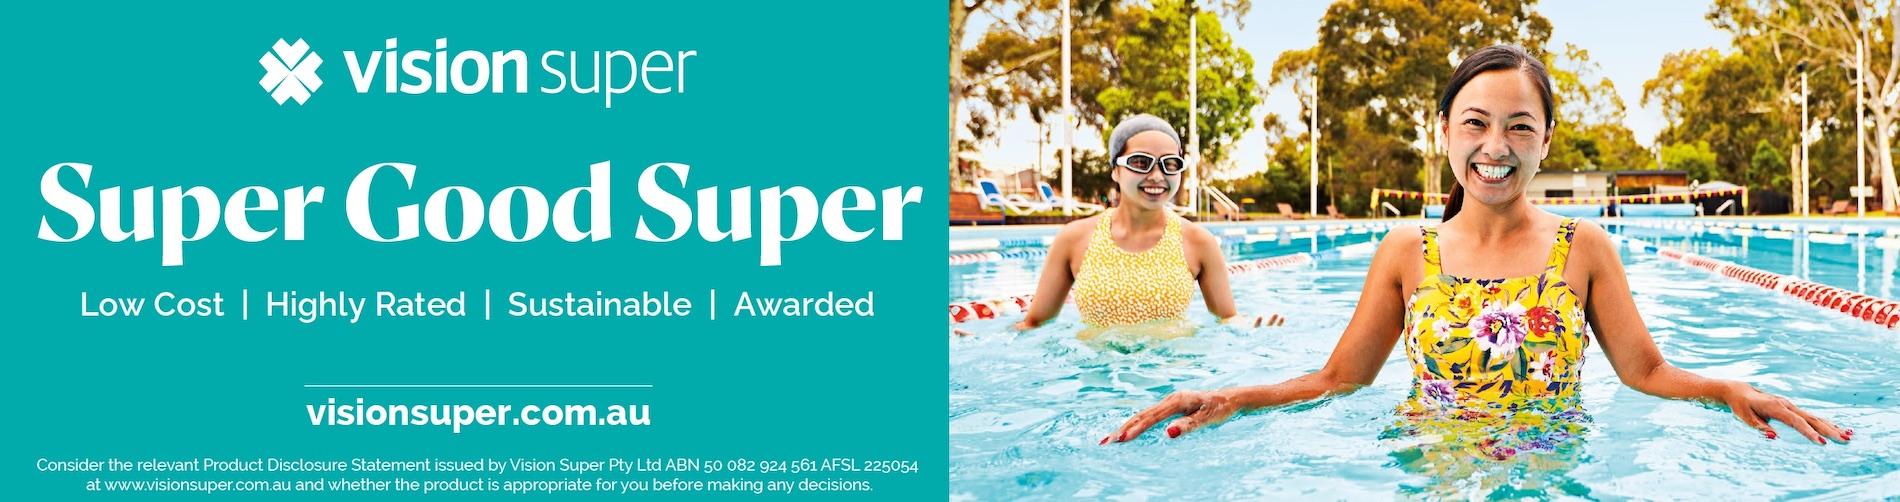 Vision Super launches new 'Super Good Super' campaign via The Fuel Agency, Melbourne